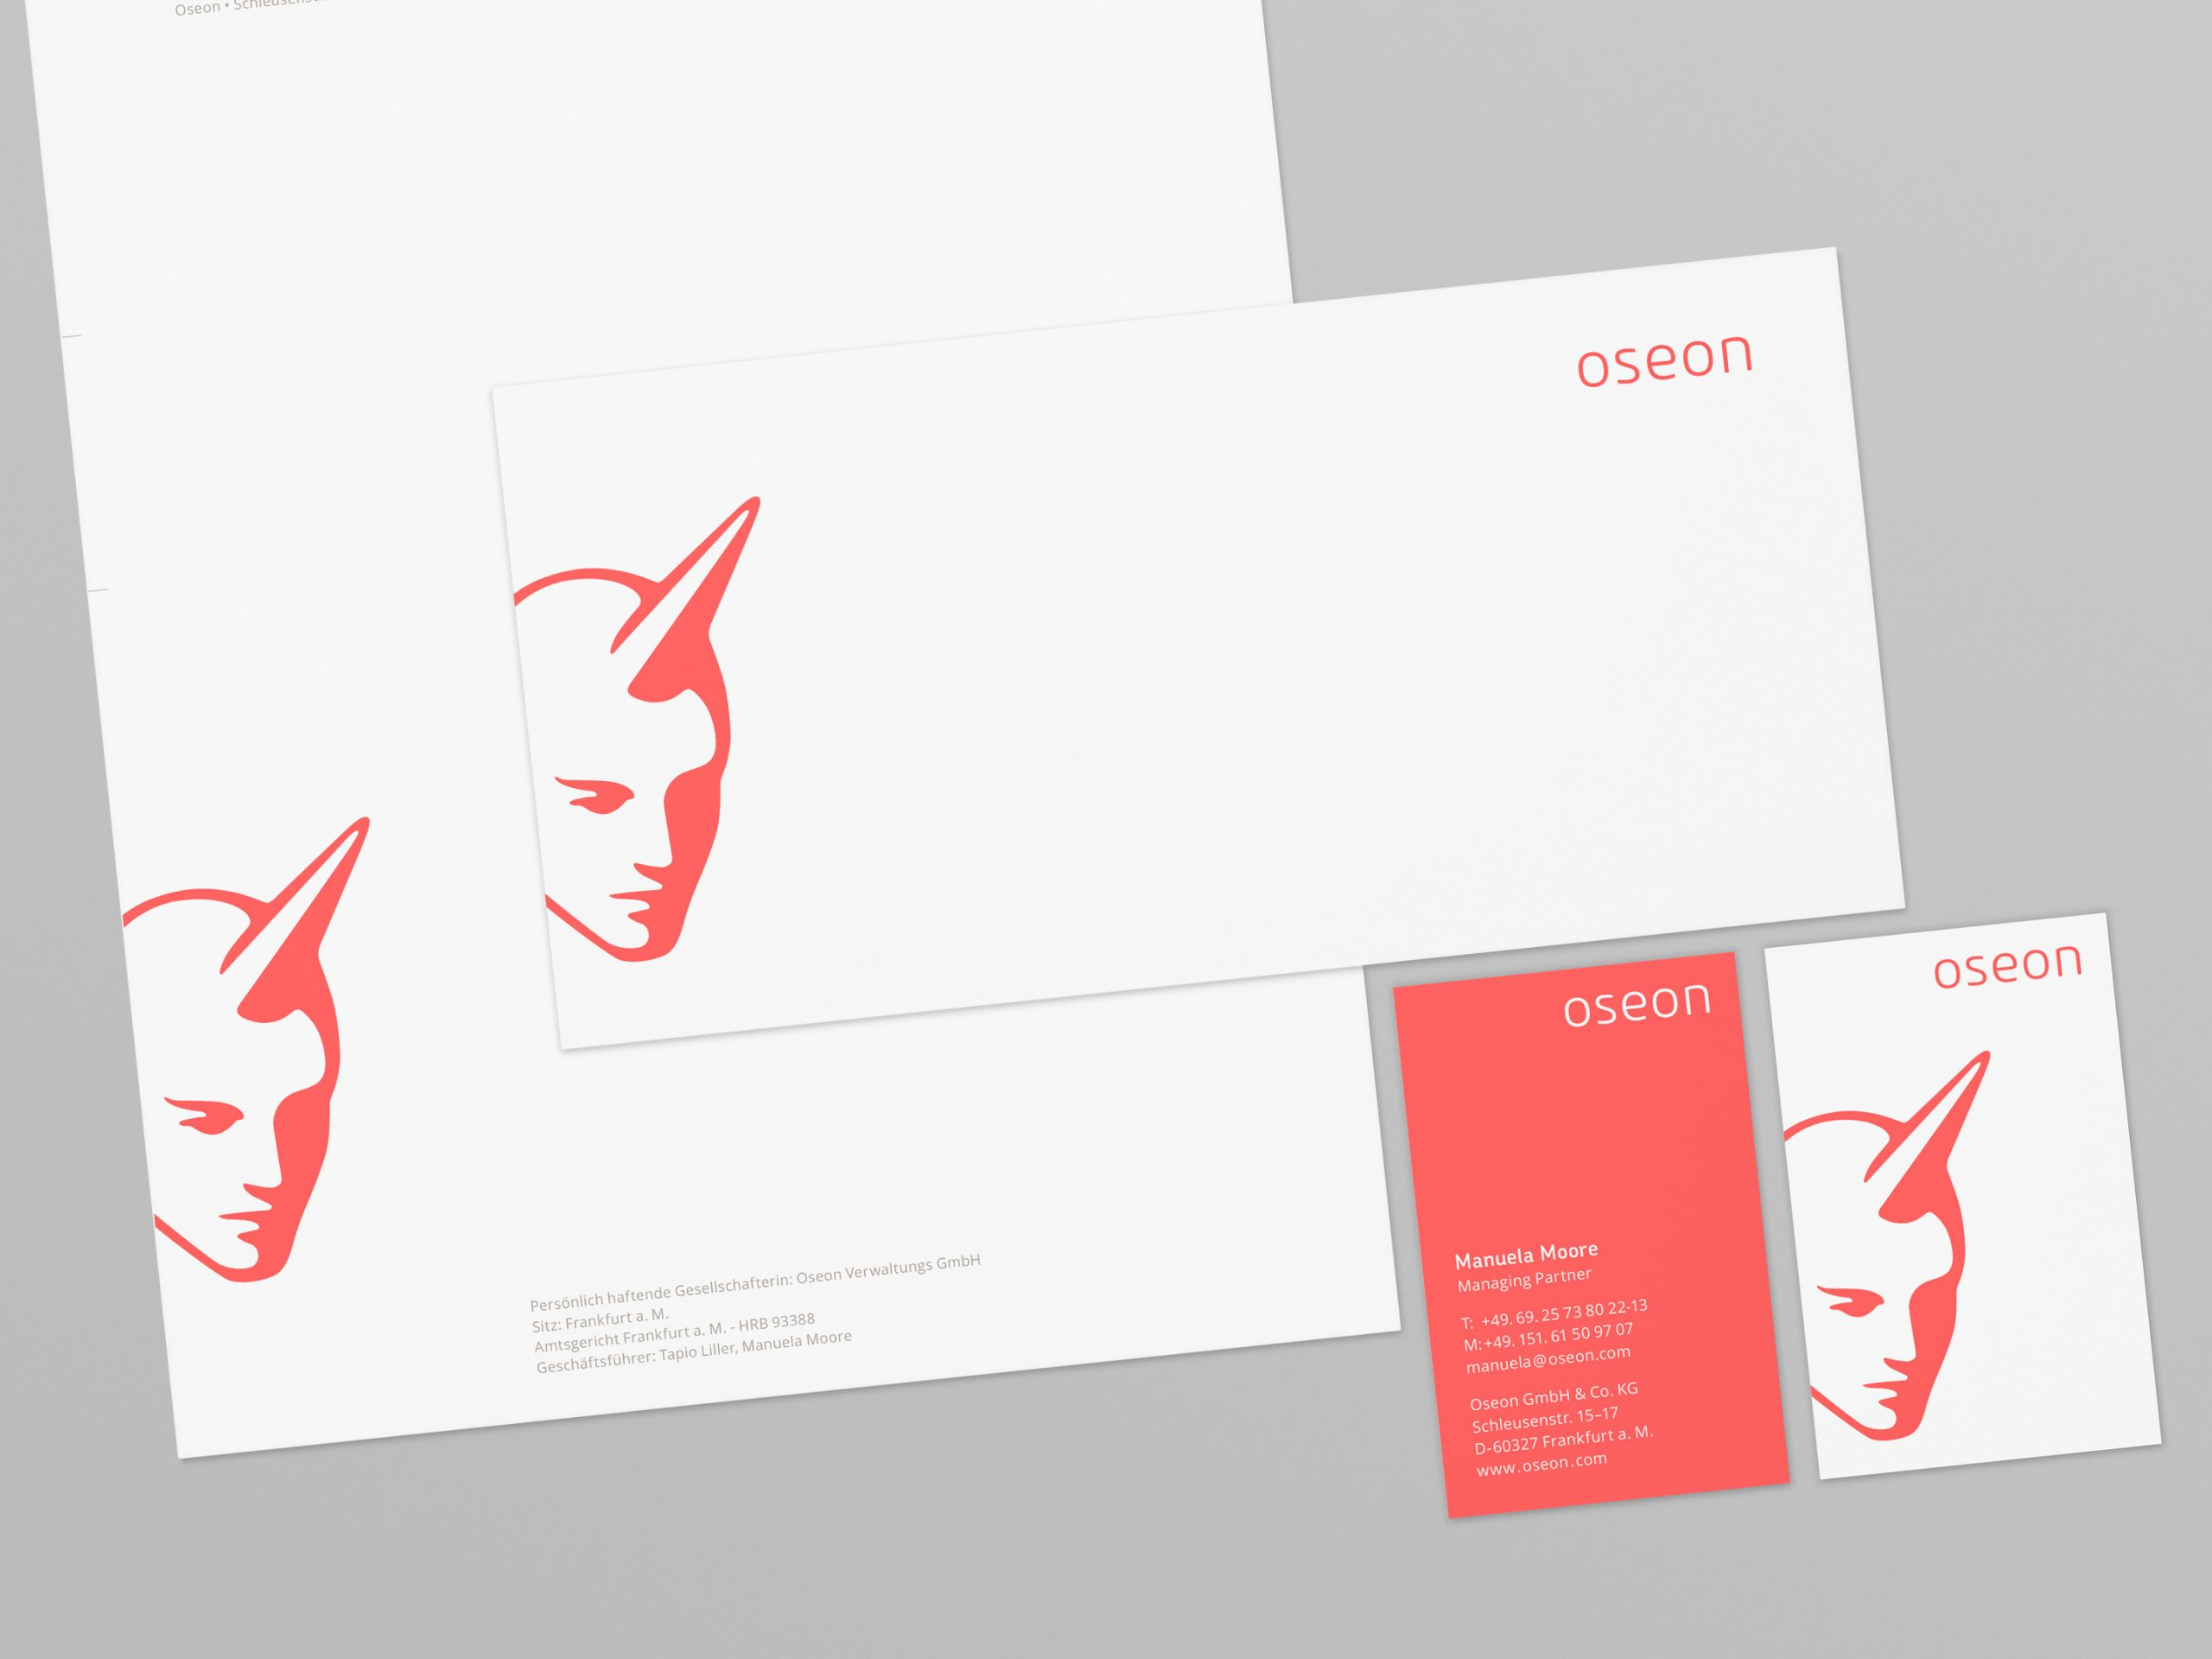 oseon-slider_p43